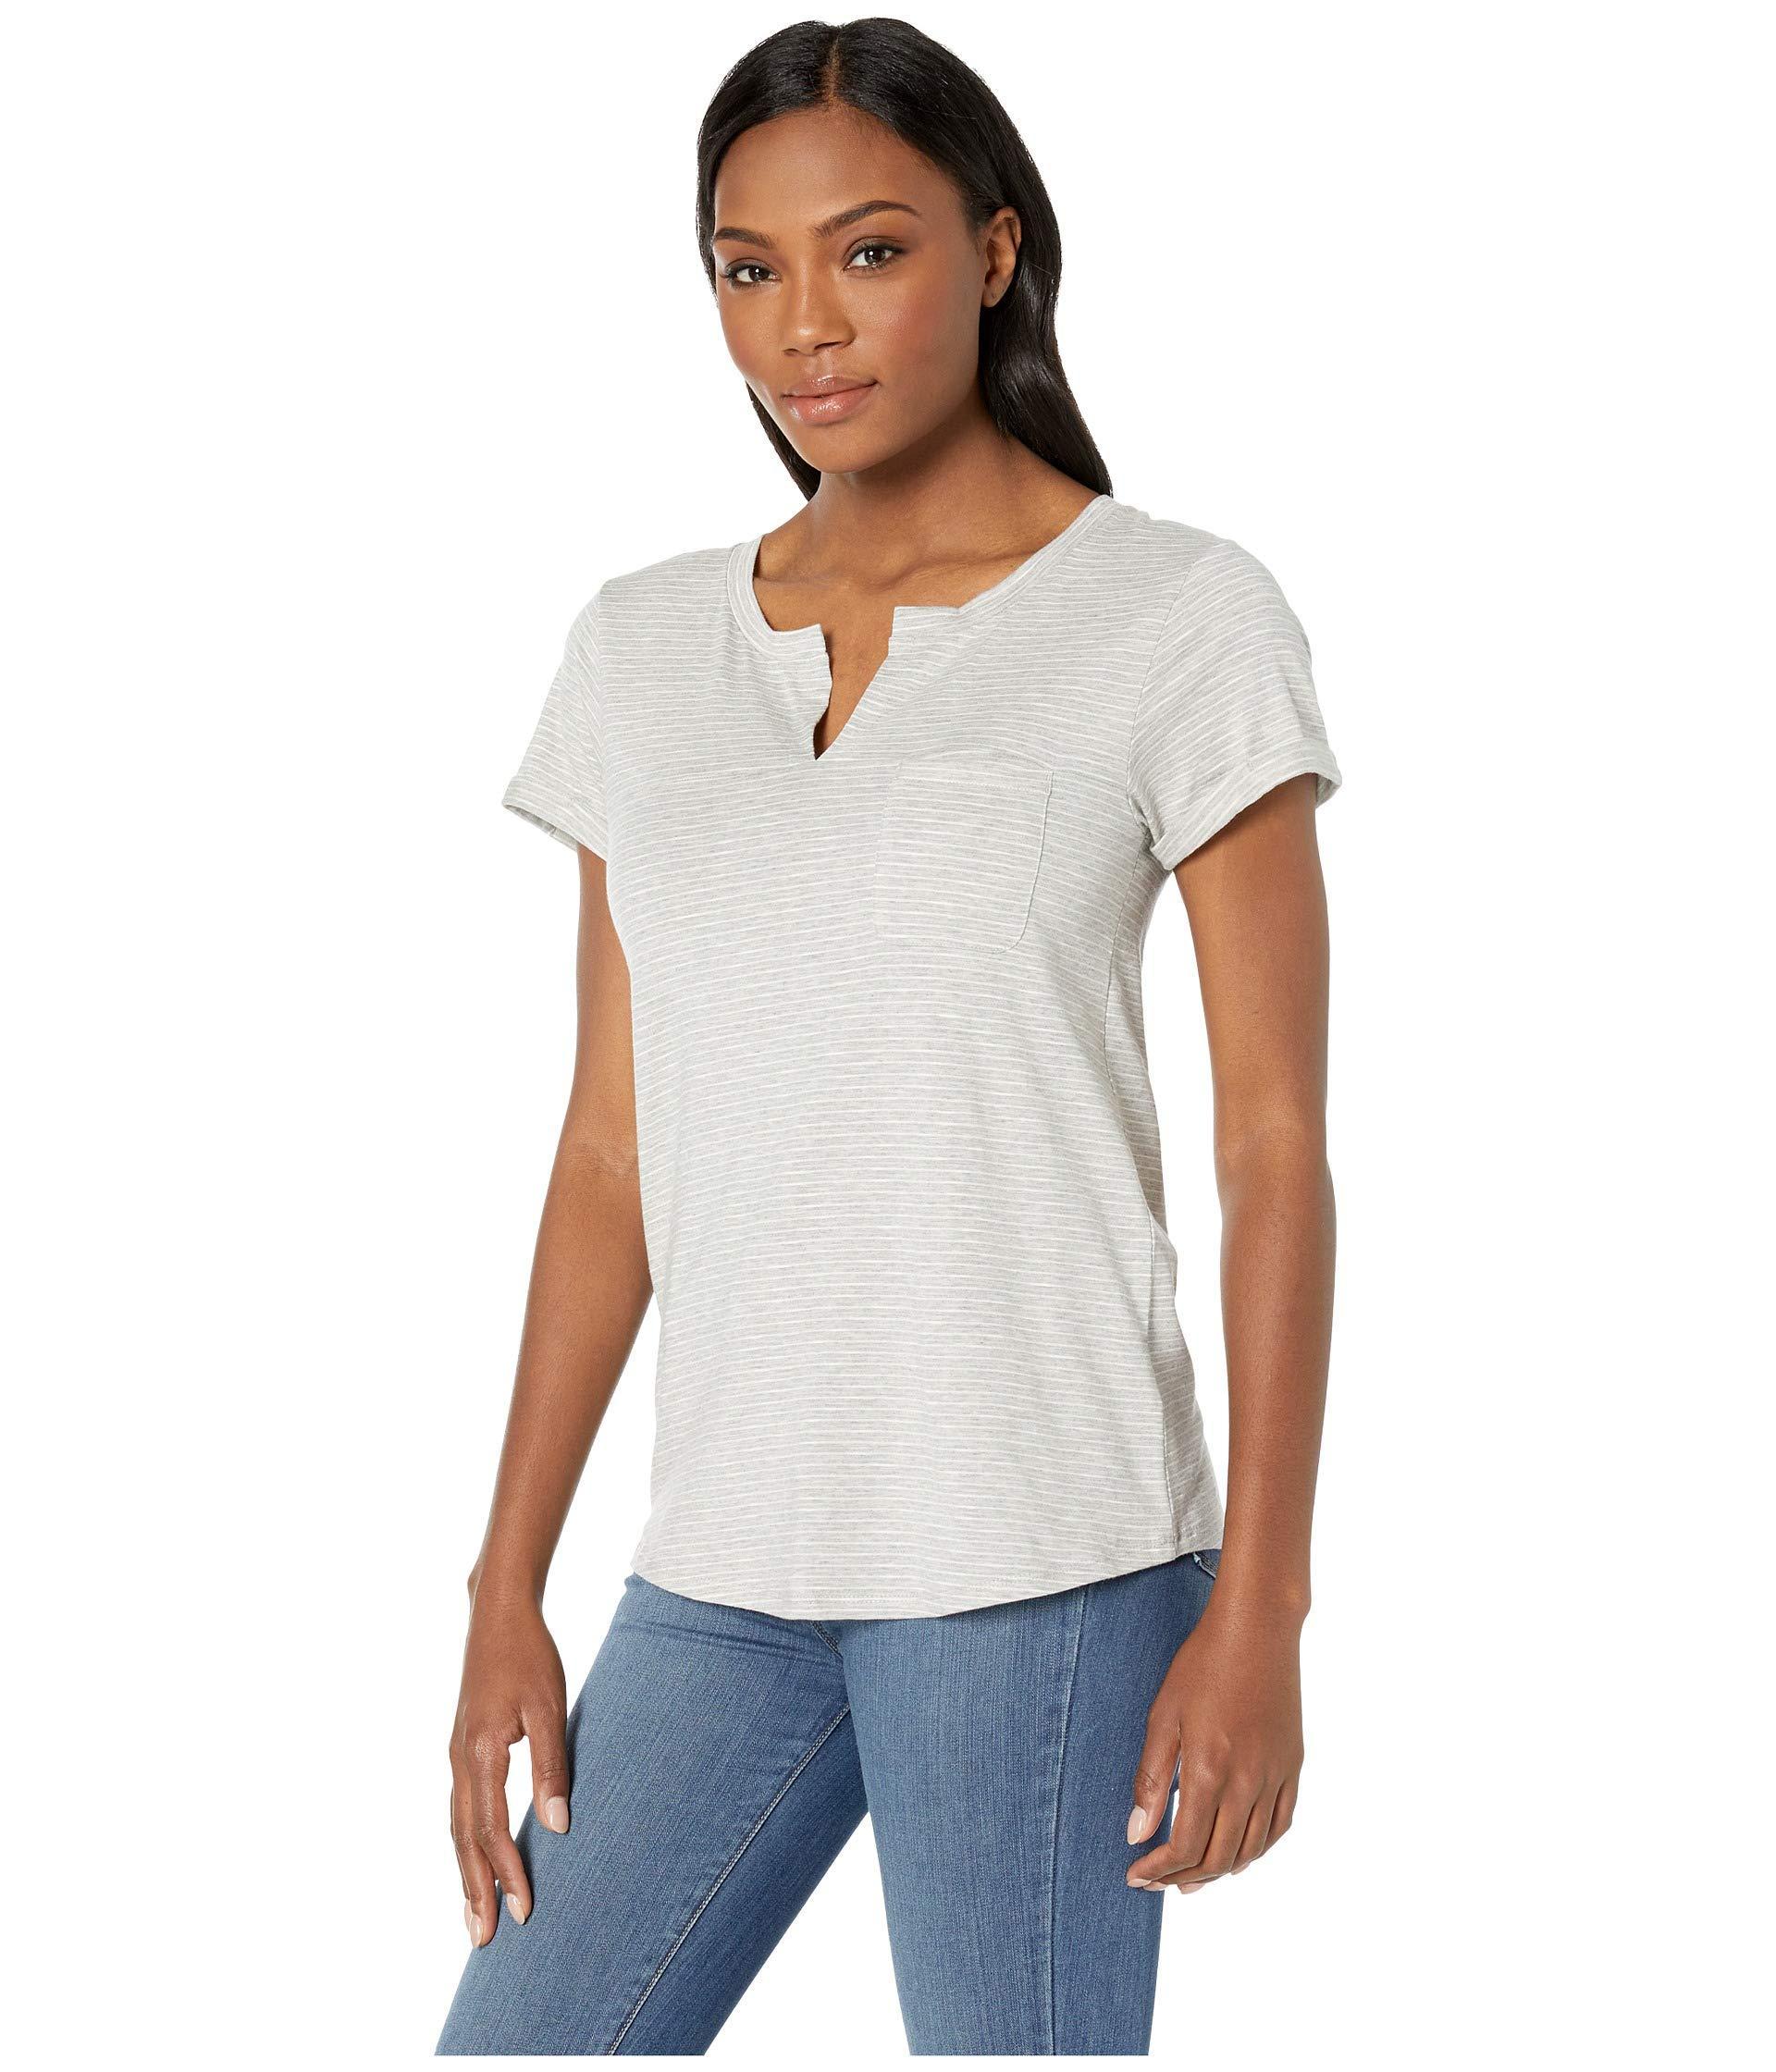 61746a241b Lyst - Toad&Co Sambasta Short Sleeve Tee (heather Grey Mini Stripe) Women's  T Shirt in Gray